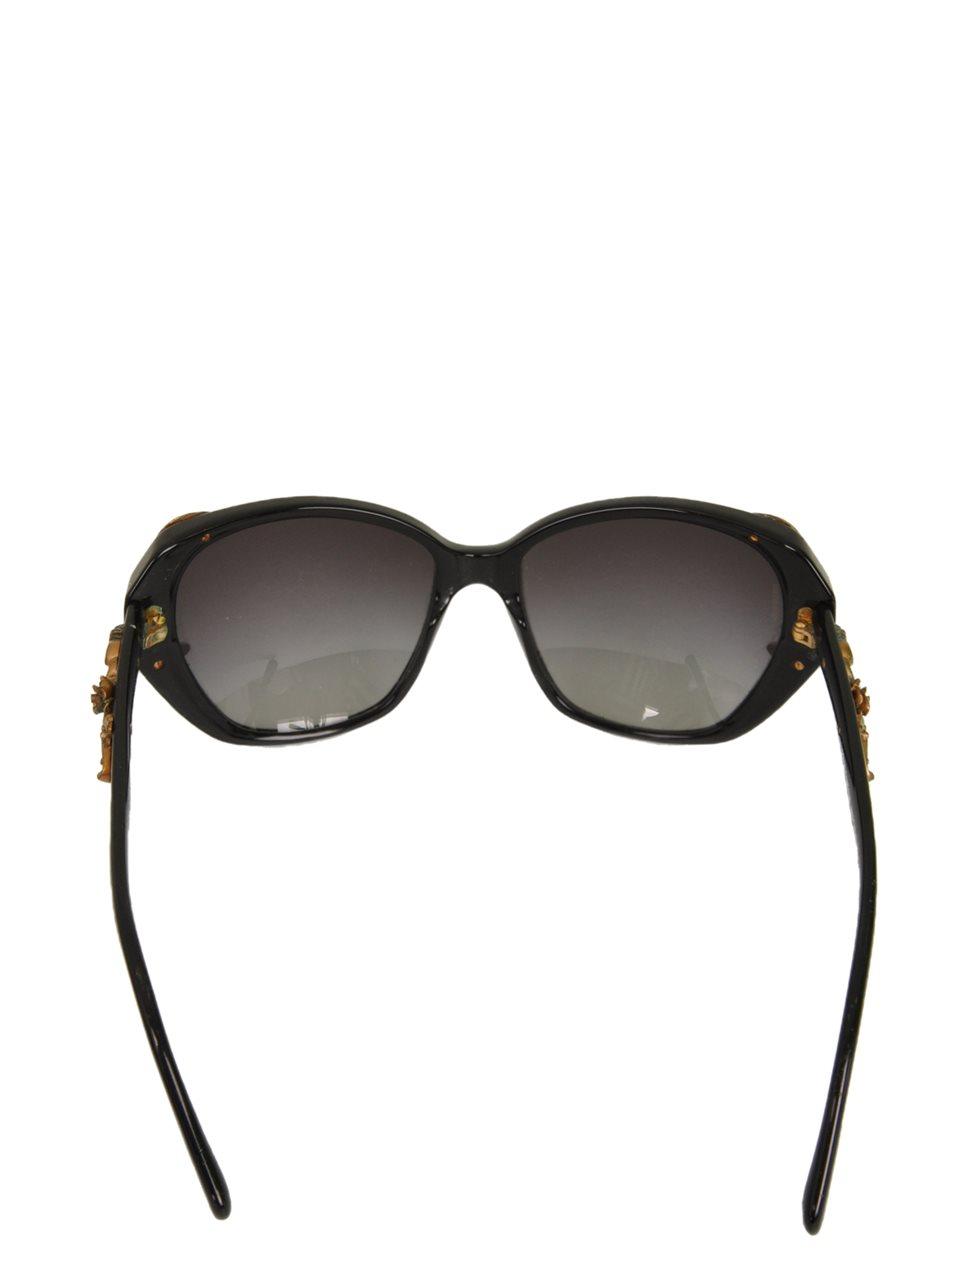 Dolce & Gabbana - Sicilian Baroque Sunglasses - Image 3 of 4